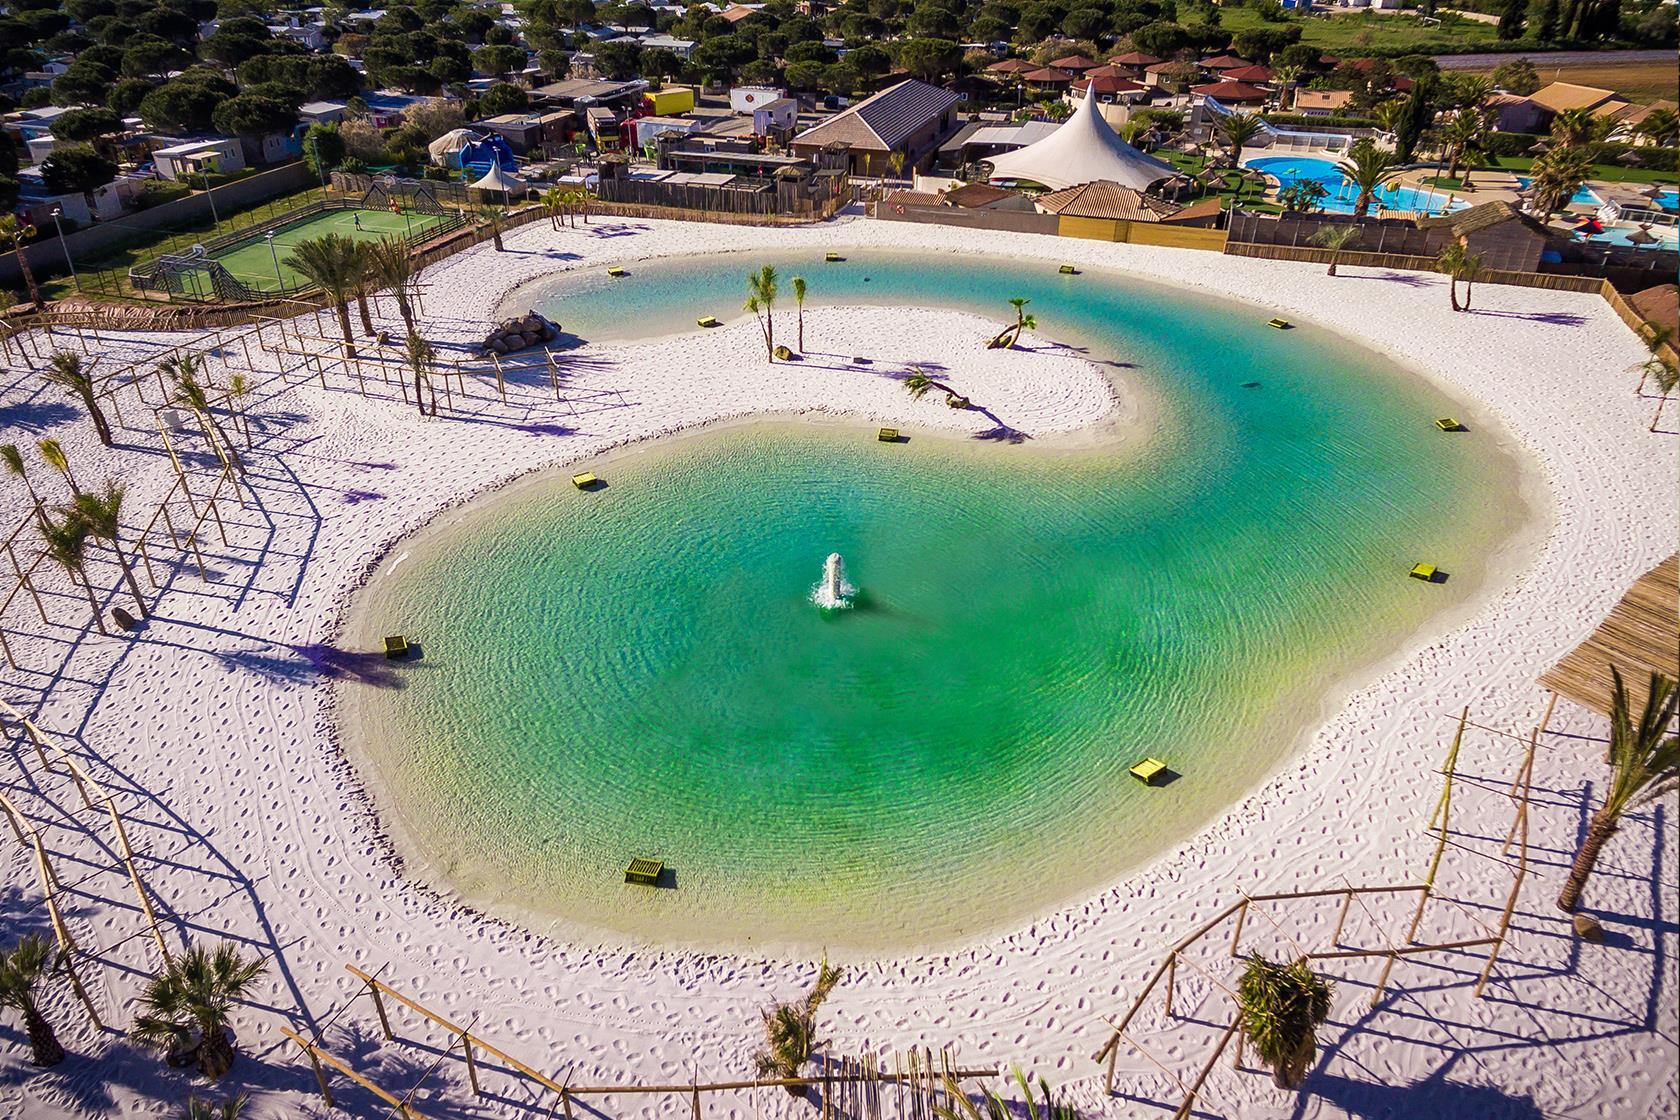 La playa de arena y la zona de la piscina de la laguna